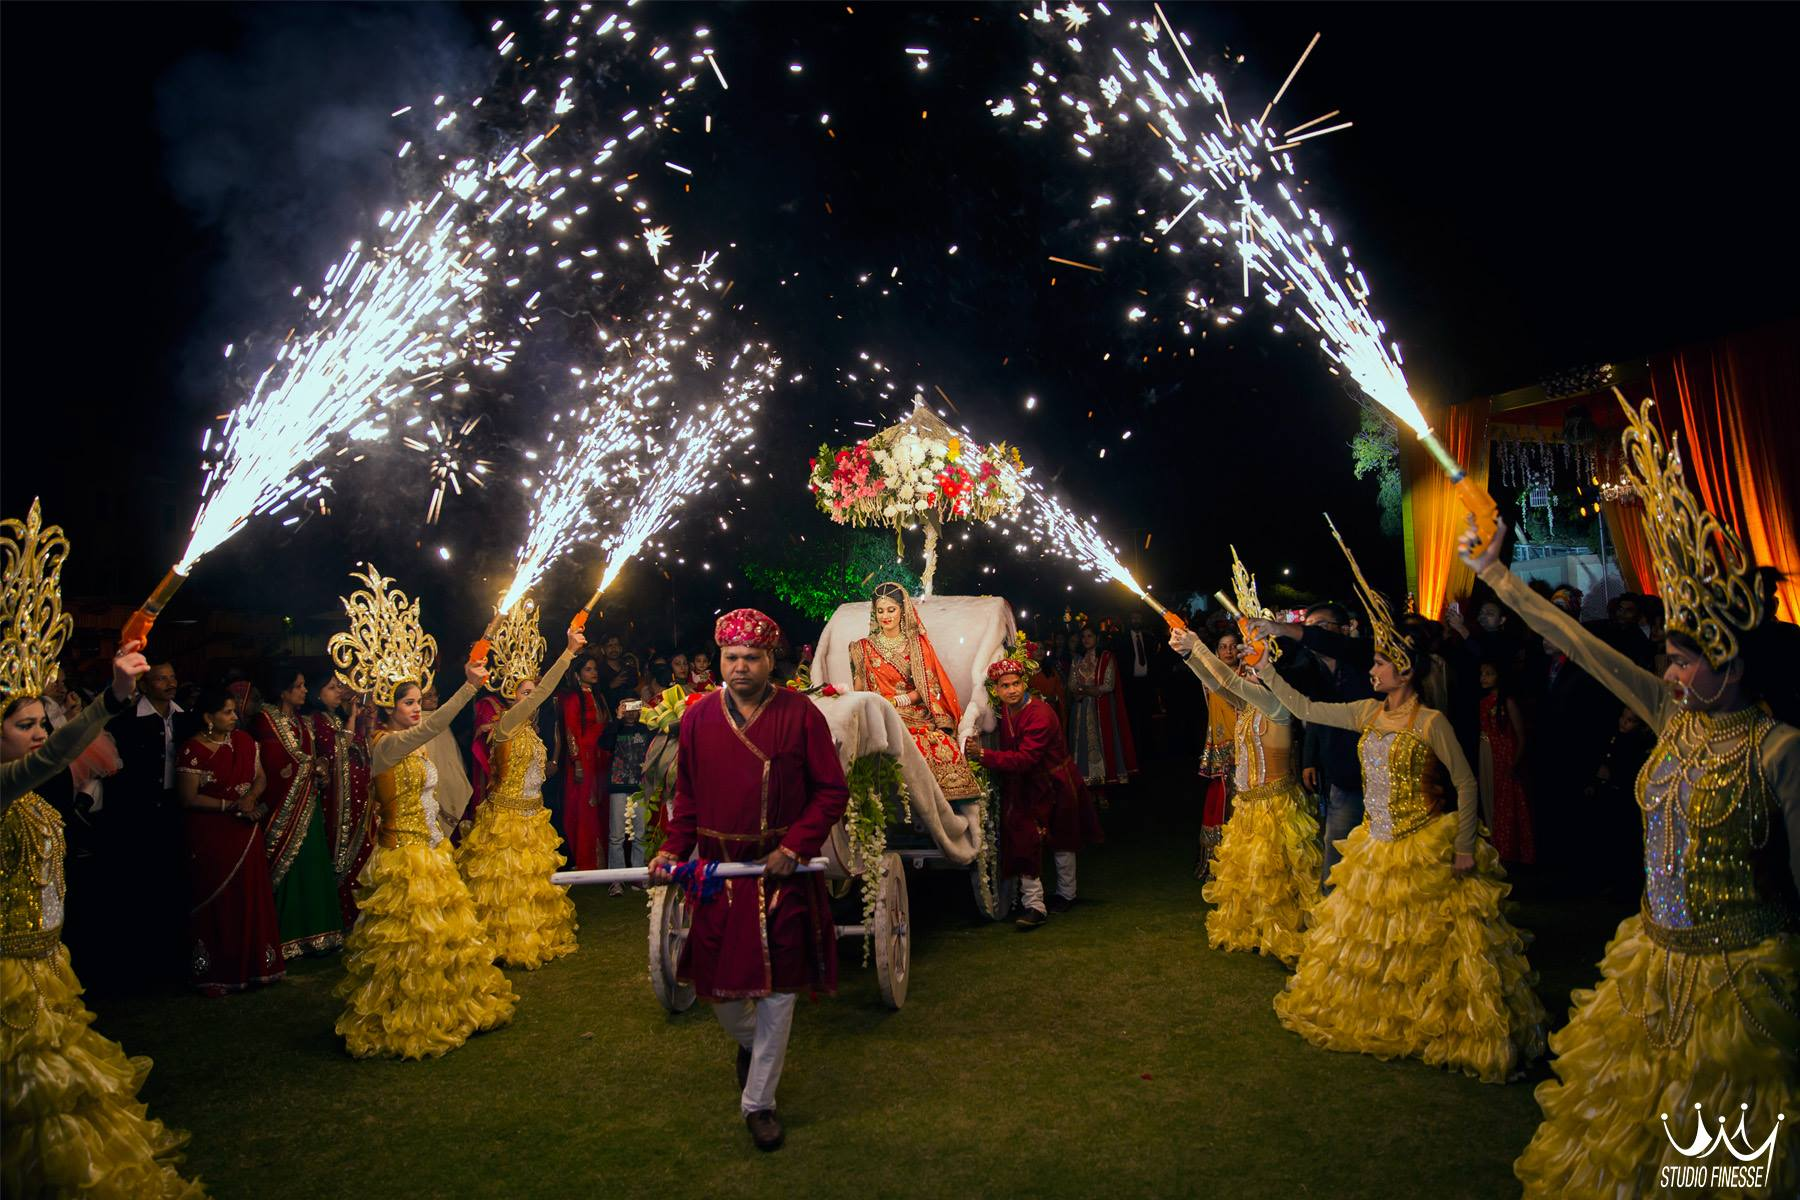 bridal entry, bride entry with sparklers, red lehenga, bridal lehenga